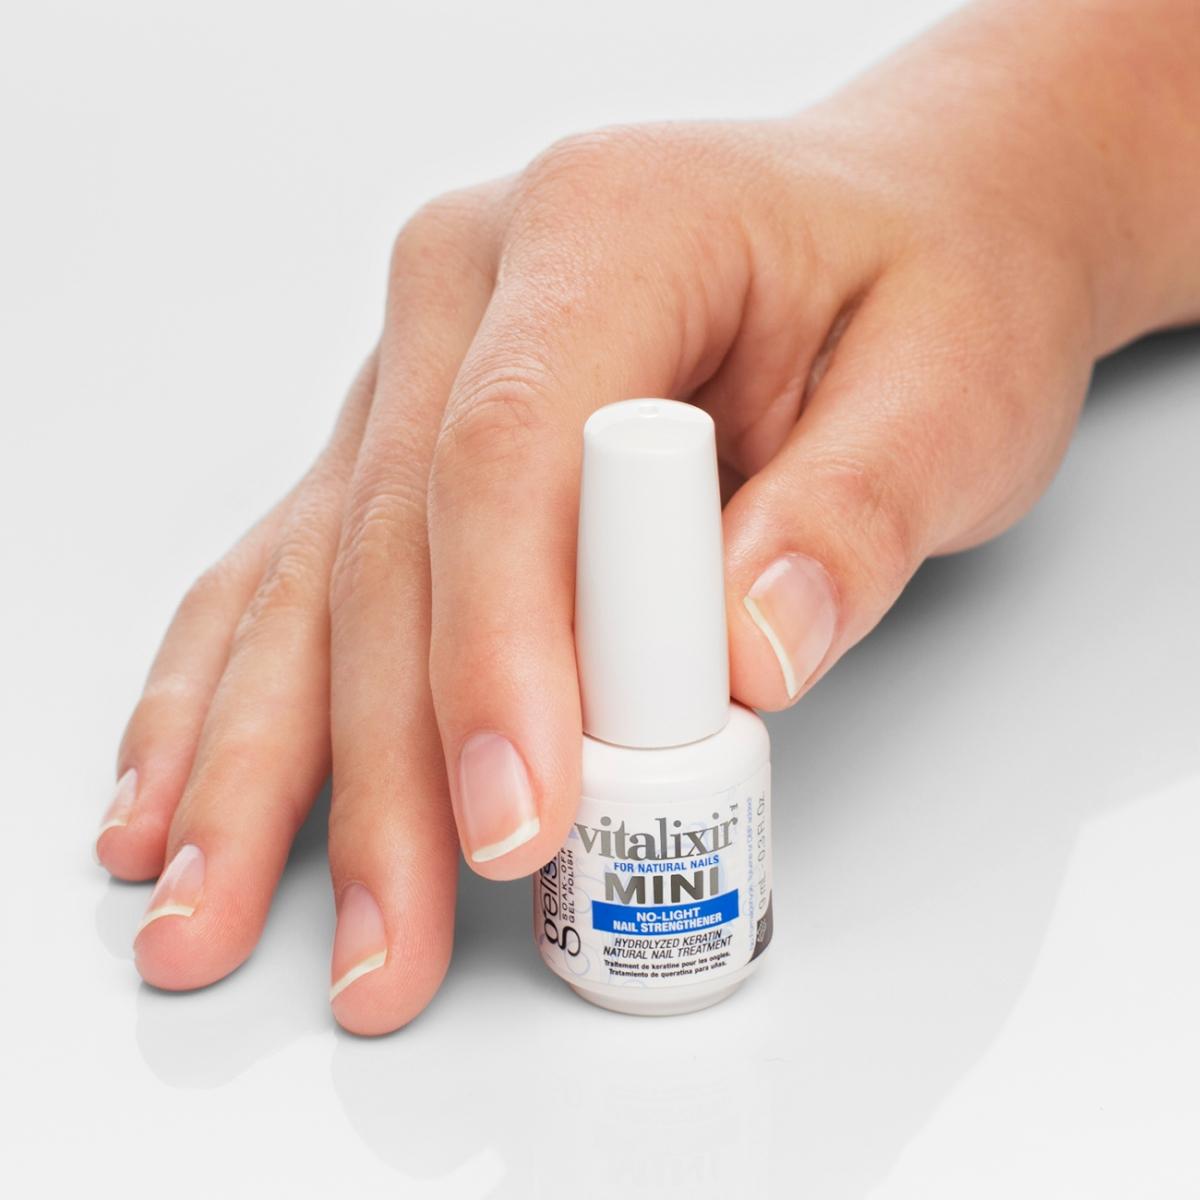 ... Vitalixir No-Light Keratin Natural Nail Treatment